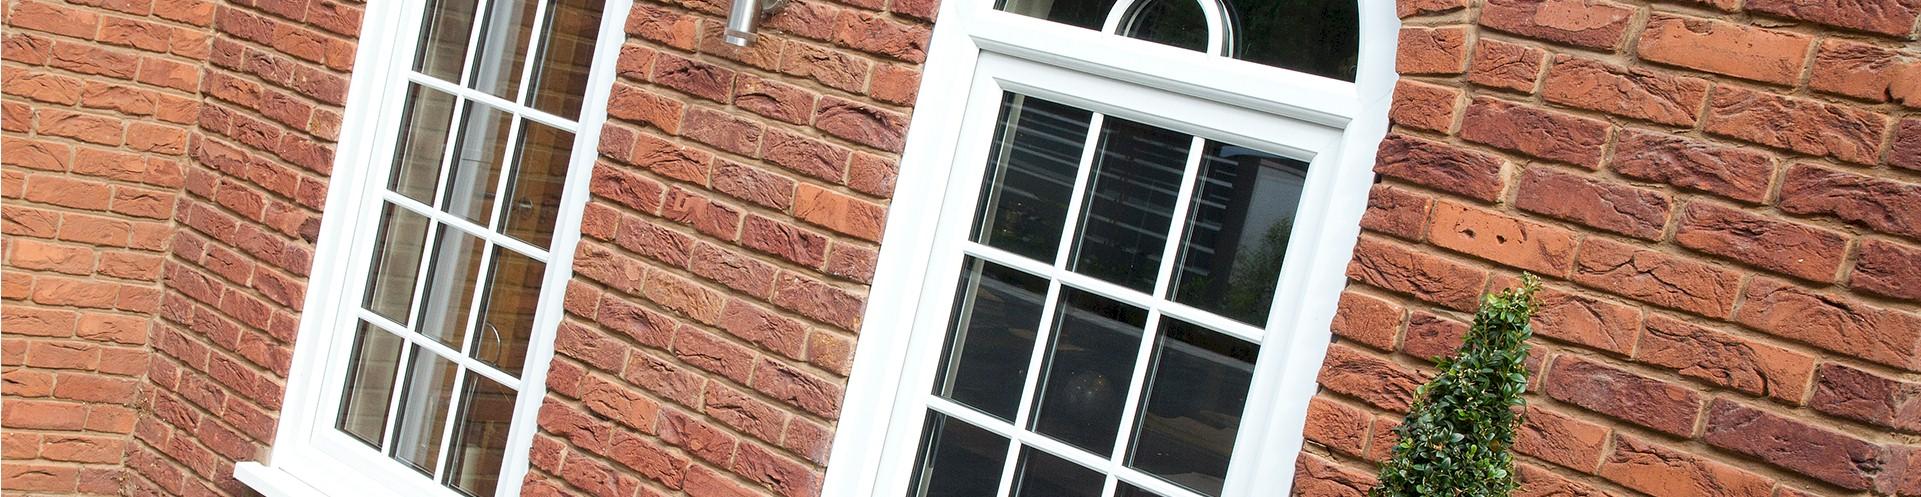 Manufacturer of upvc plastic double glazed windows for Upvc window manufacturers